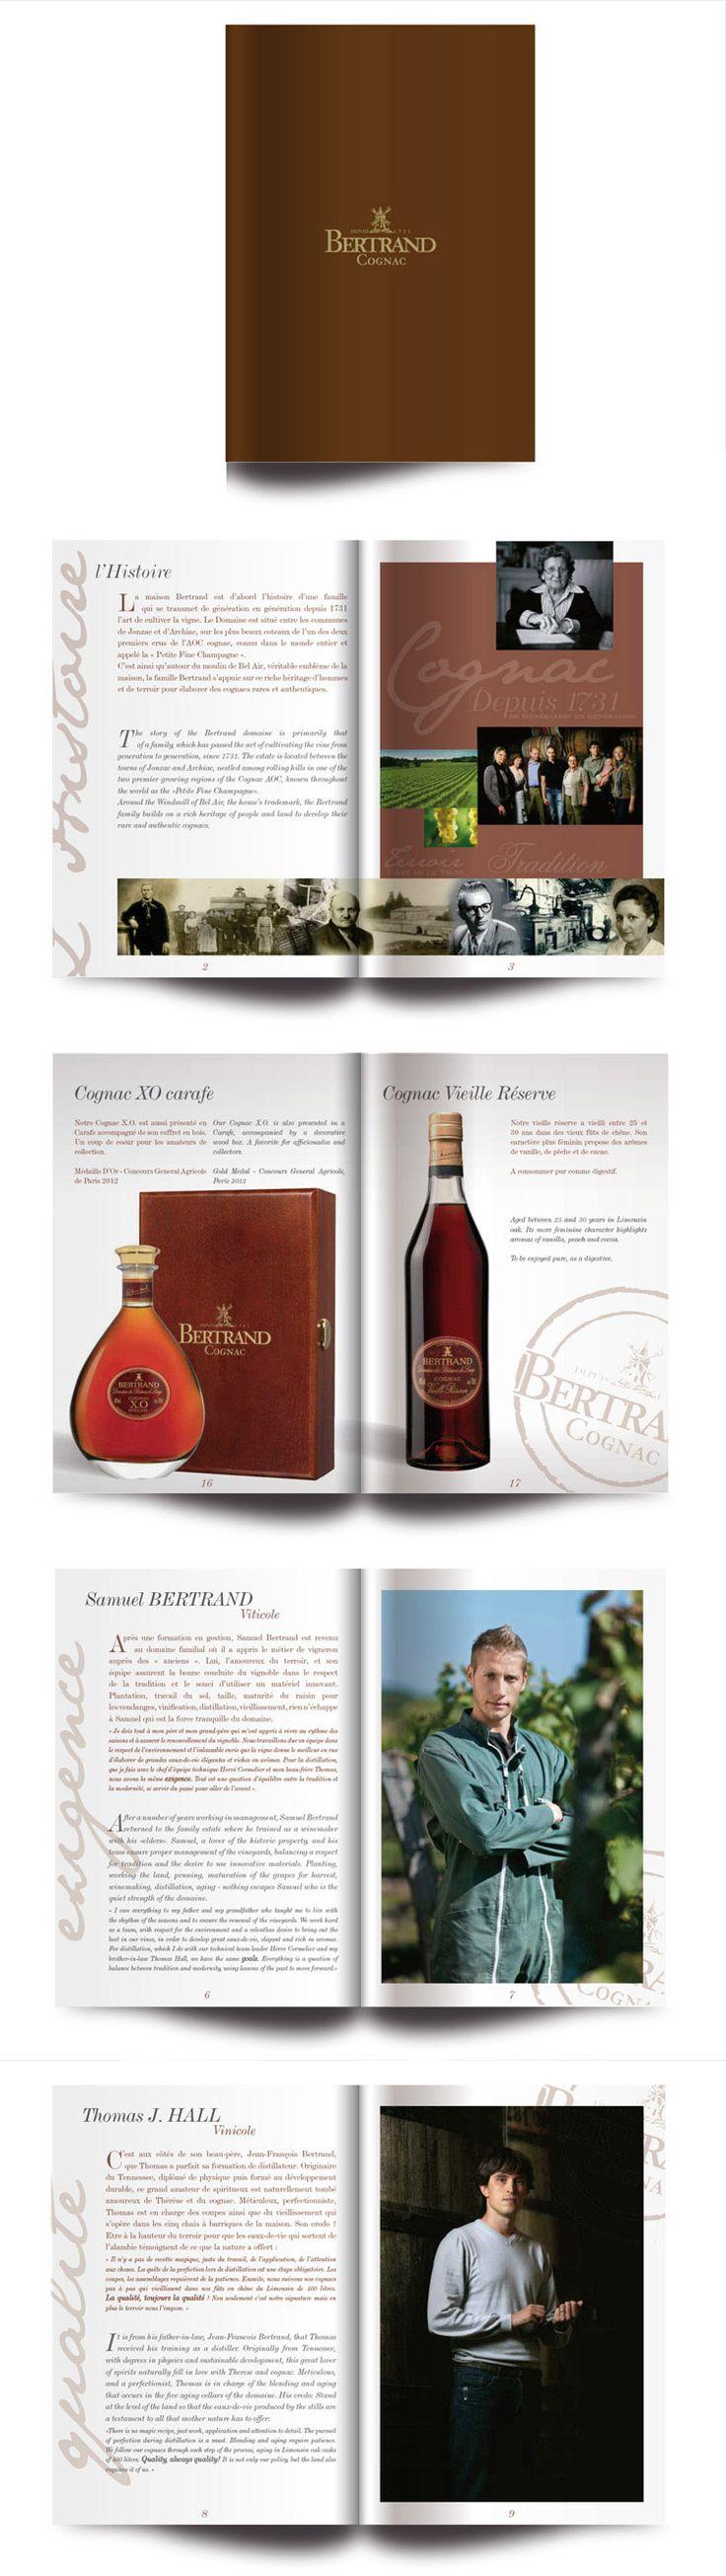 Plaquette Cognac Bertrand